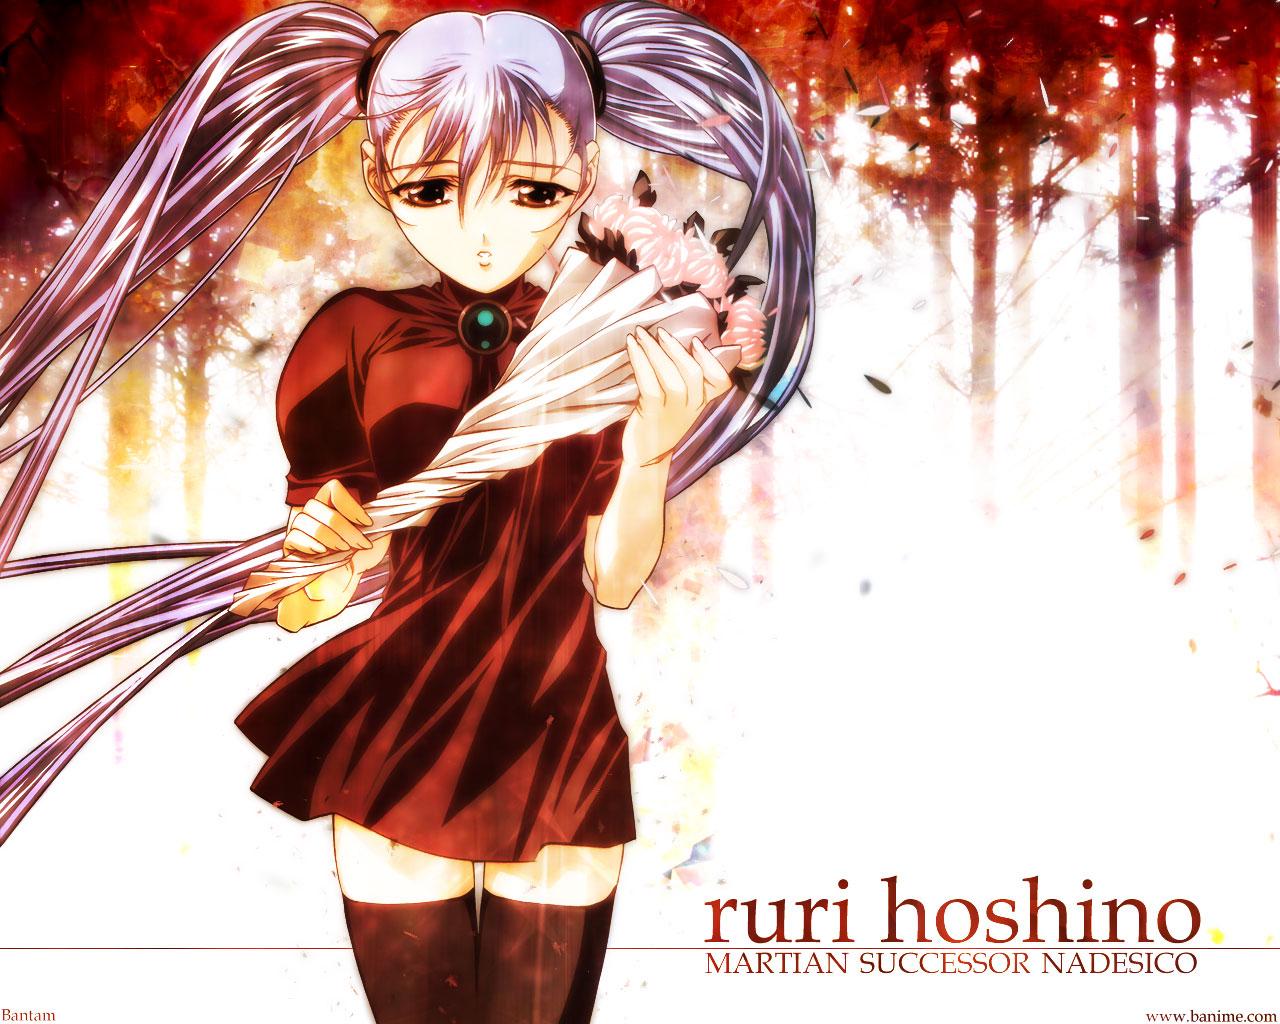 flowers gray_hair hoshino_ruri long_hair martian_successor_nadesico thighhighs twintails yellow_eyes zettai_ryouiki